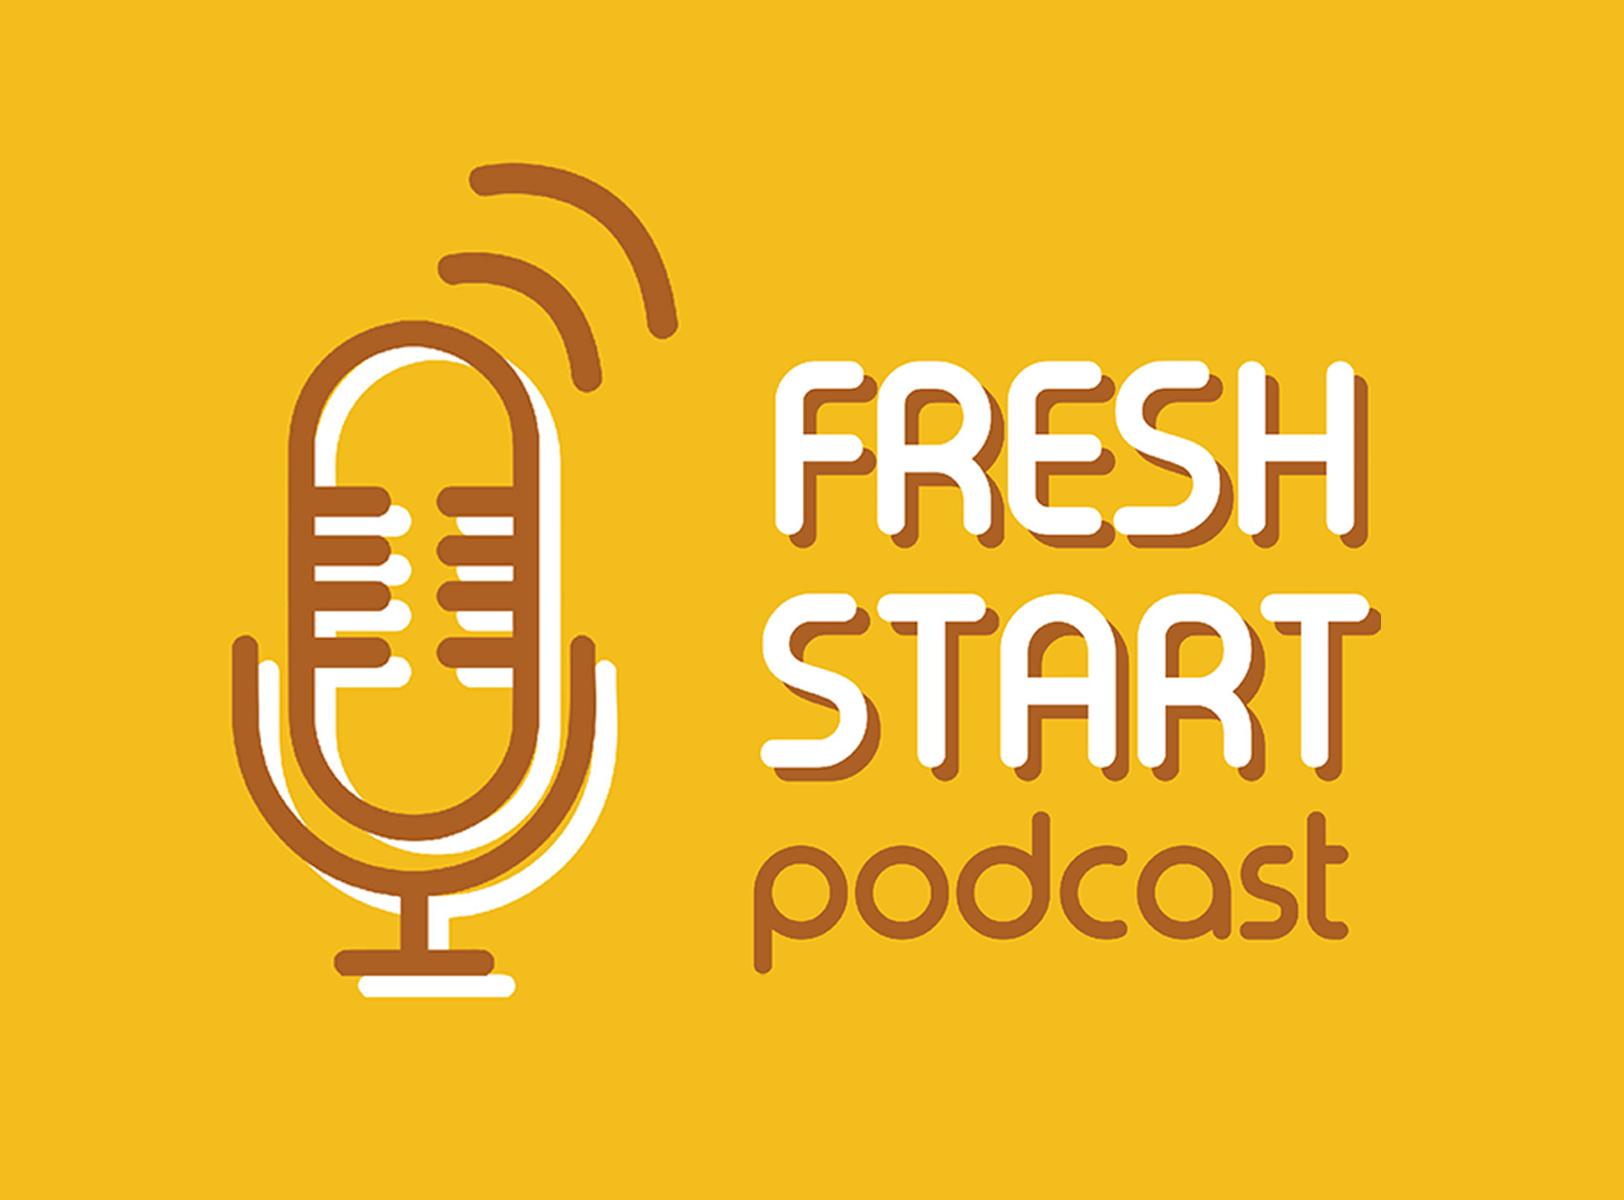 Fresh Start: Podcast News (2/5/2020 Wed.)